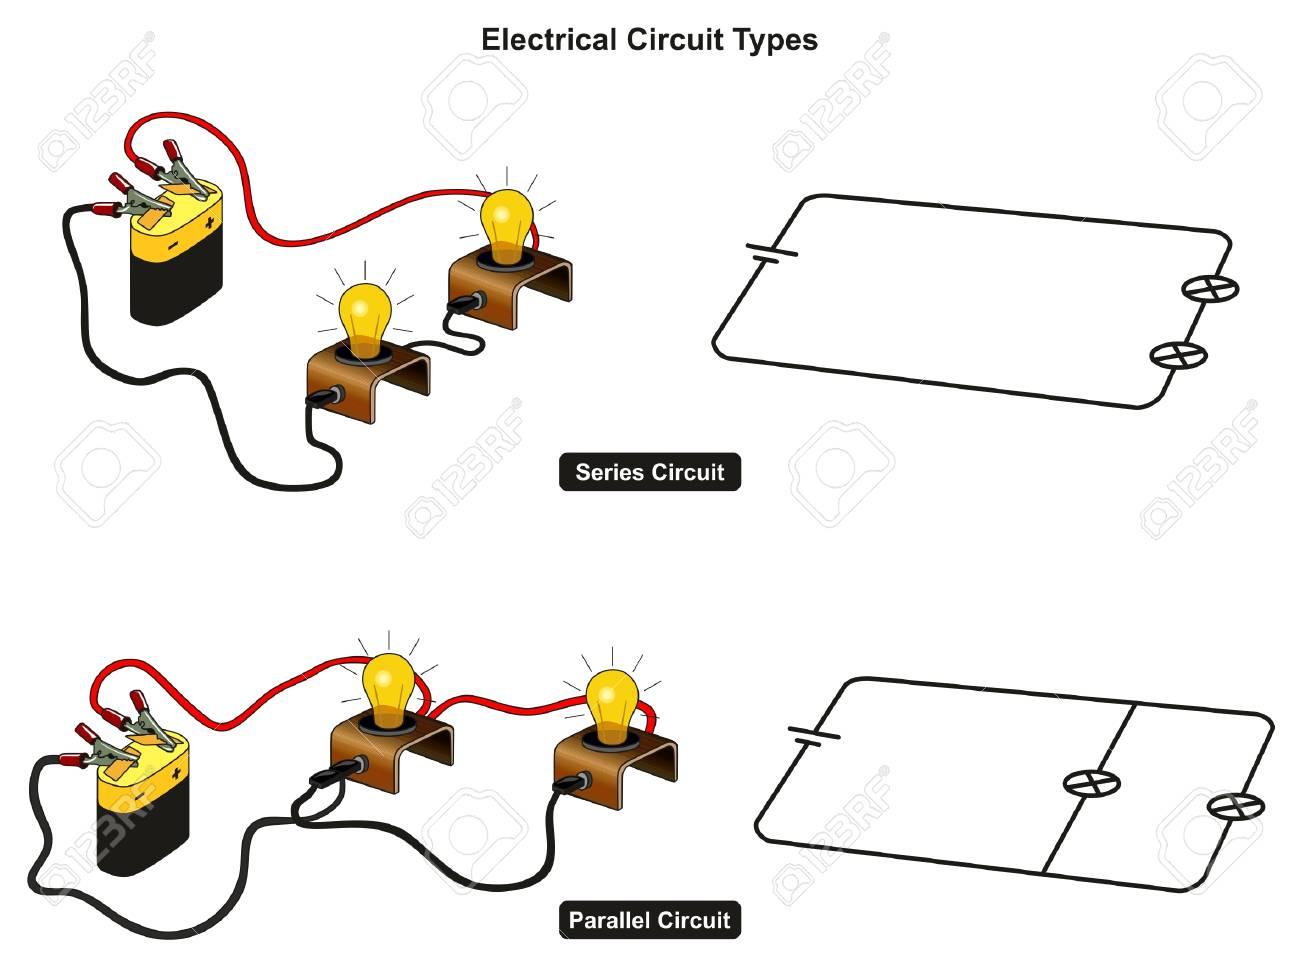 Series Wiring Diagram Series Wiring Diagram